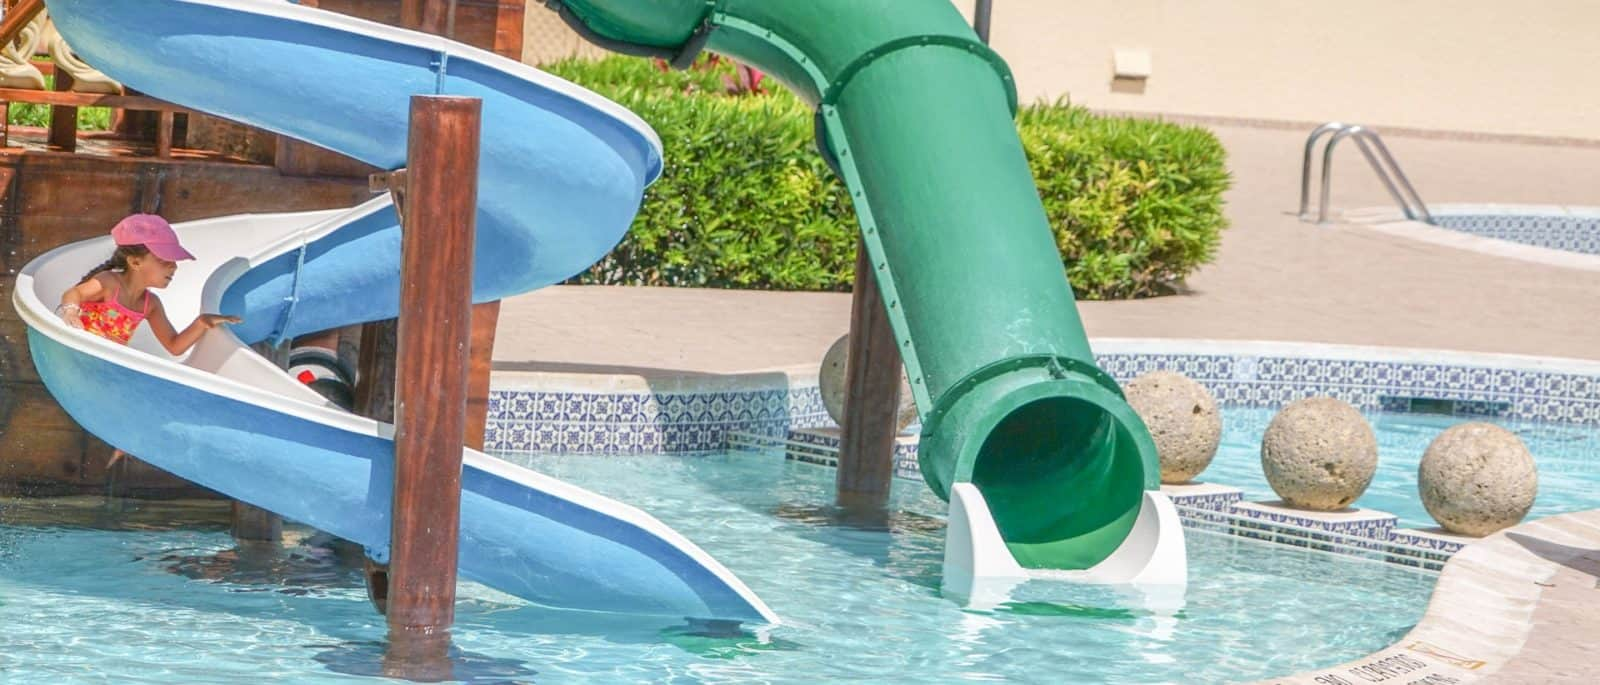 girl on slide in pool